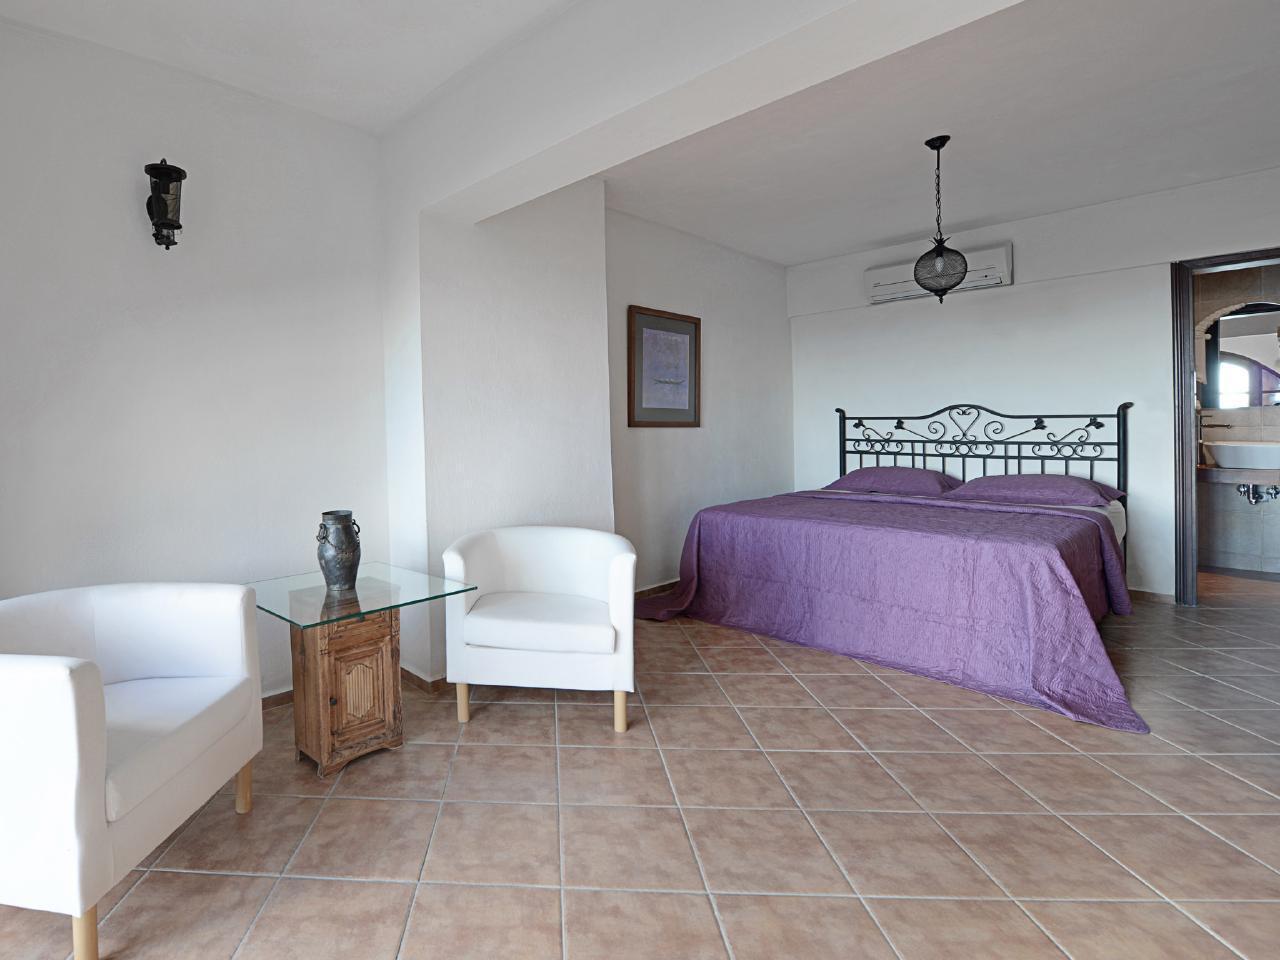 Maison de vacances Exklusives Chalet, romantisch am Berghang und Meer gelegen (2506674), Mesudiye, , Région Egéenne, Turquie, image 6